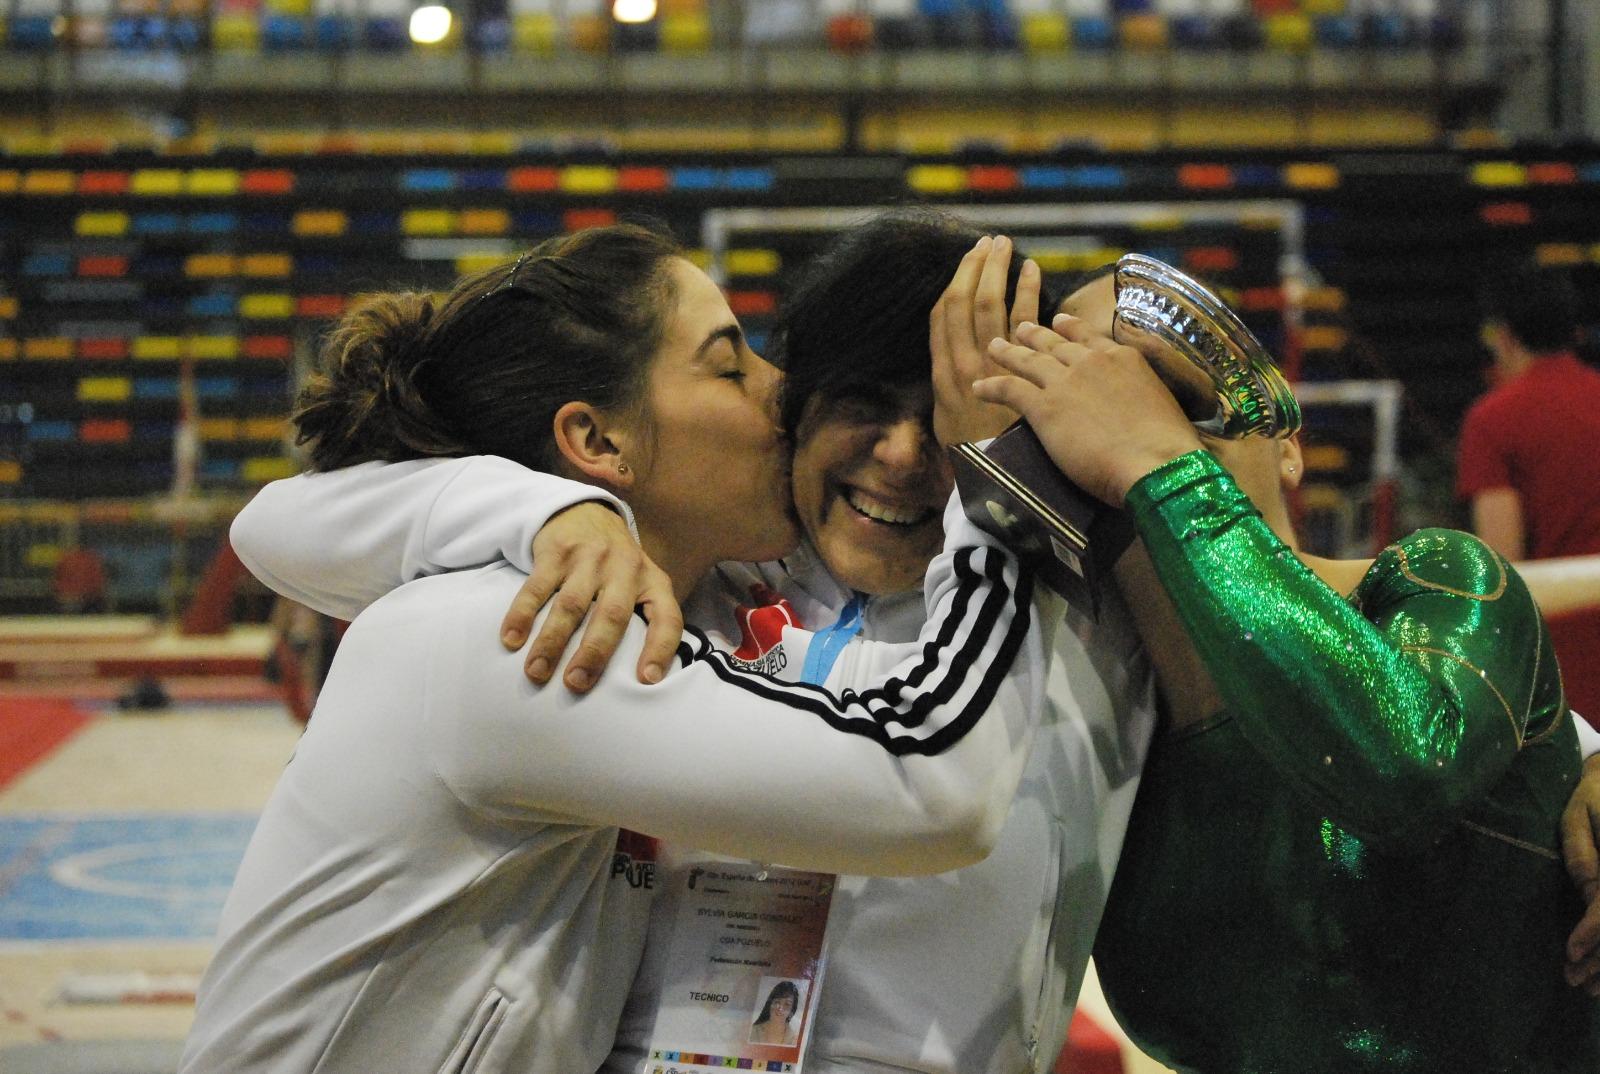 Entrenadoras de gimnasia artística abrazando a su gimnasta